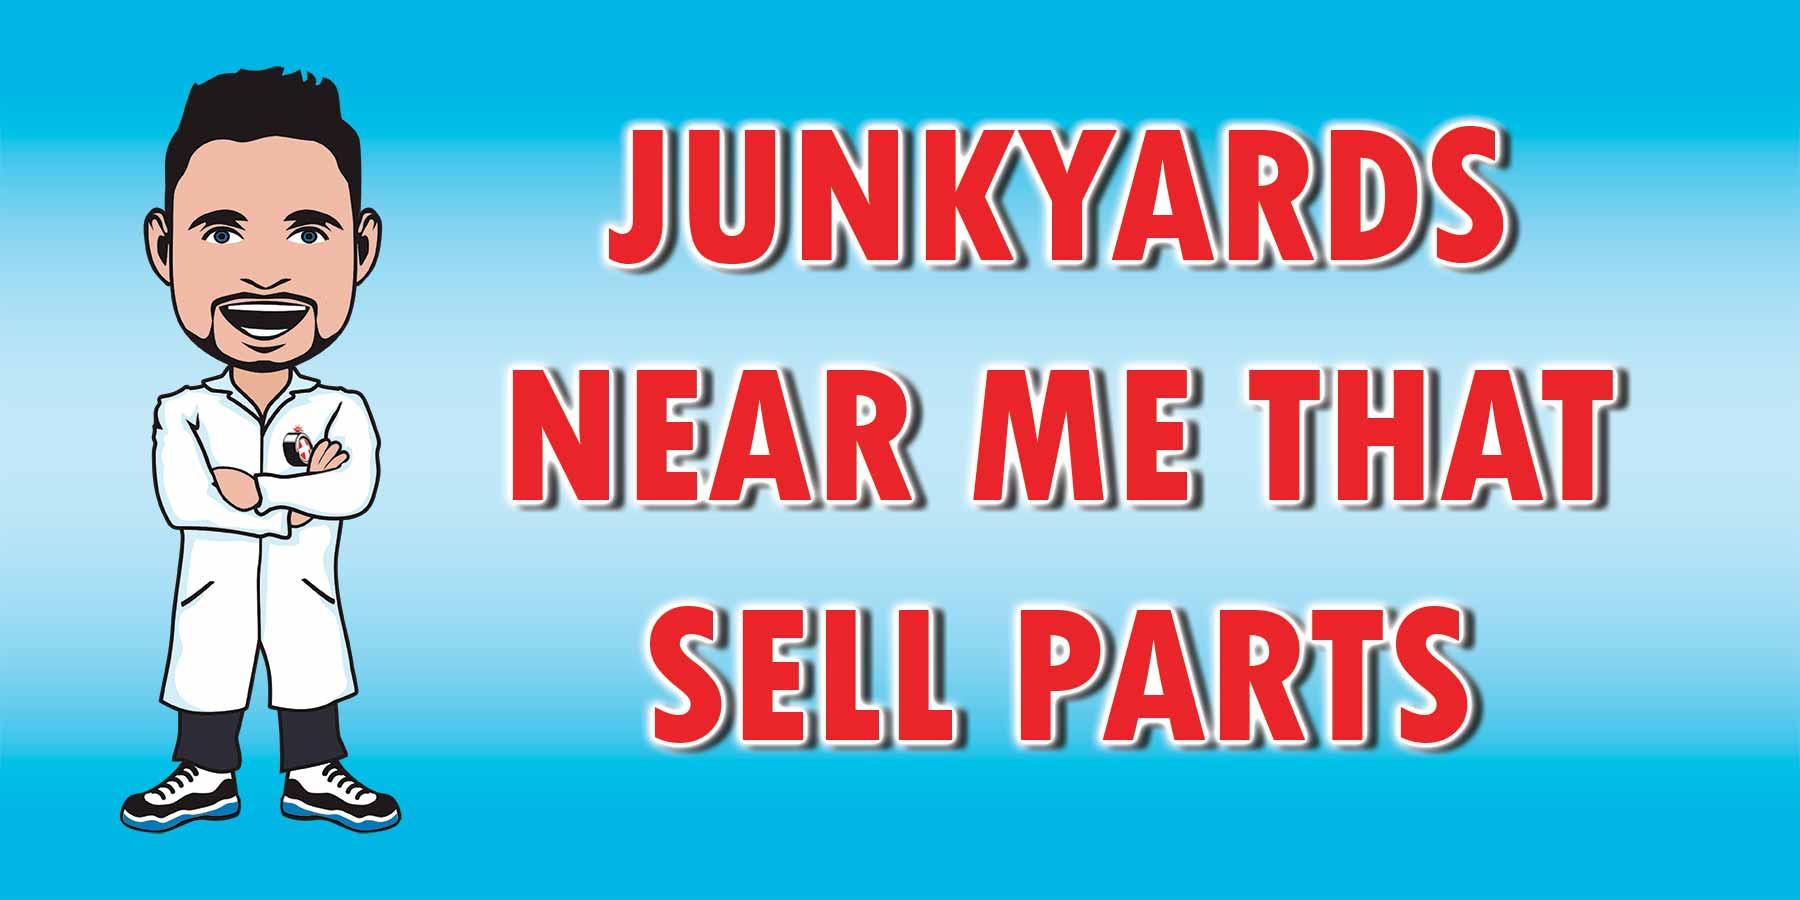 Junk My Car Near Me >> Junkyards near me that sell parts • Junk Car Medics